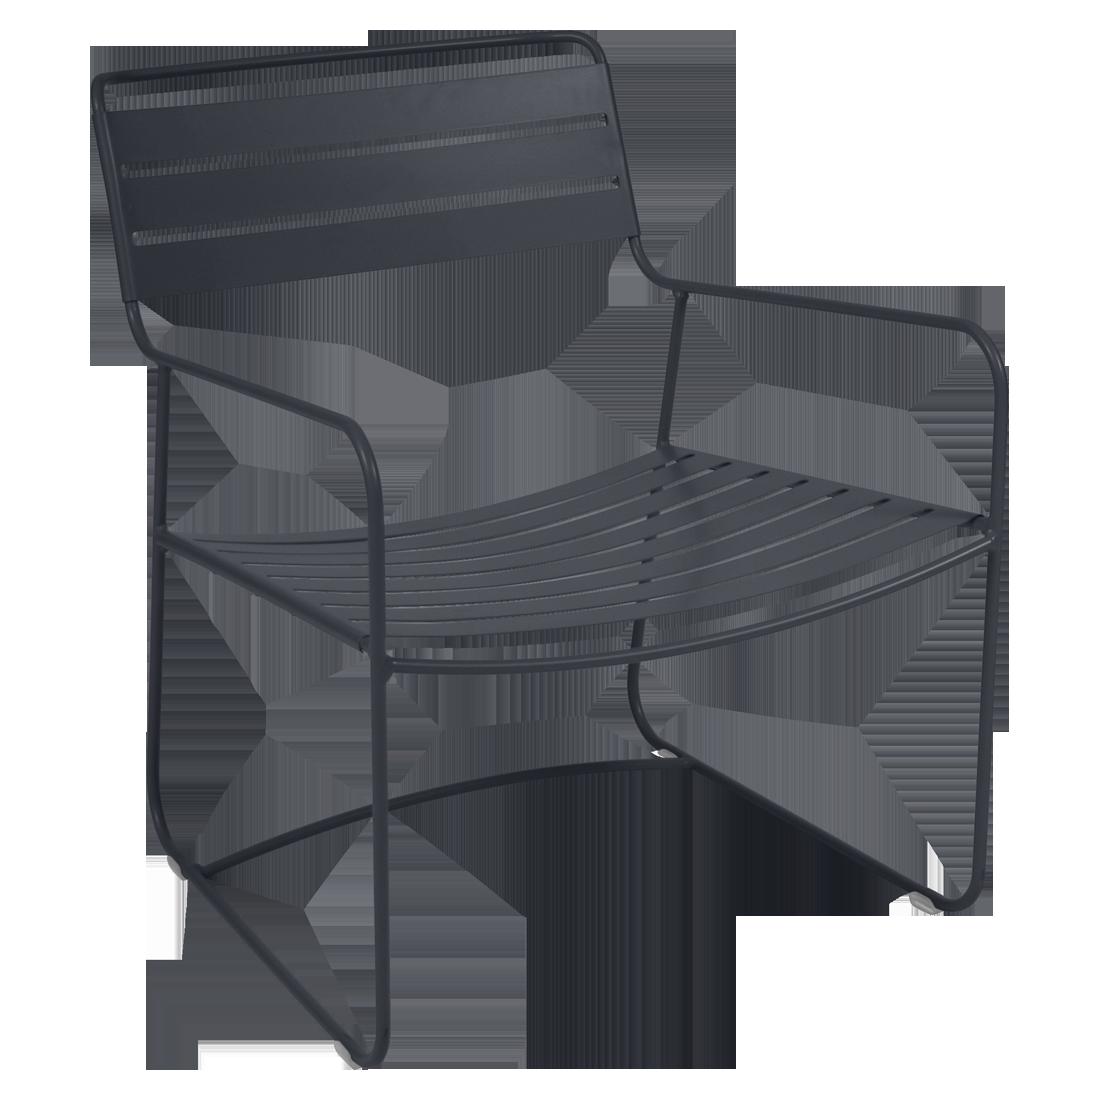 Fauteuil bas Surprising, fauteuil de jardin pour salon de jardin